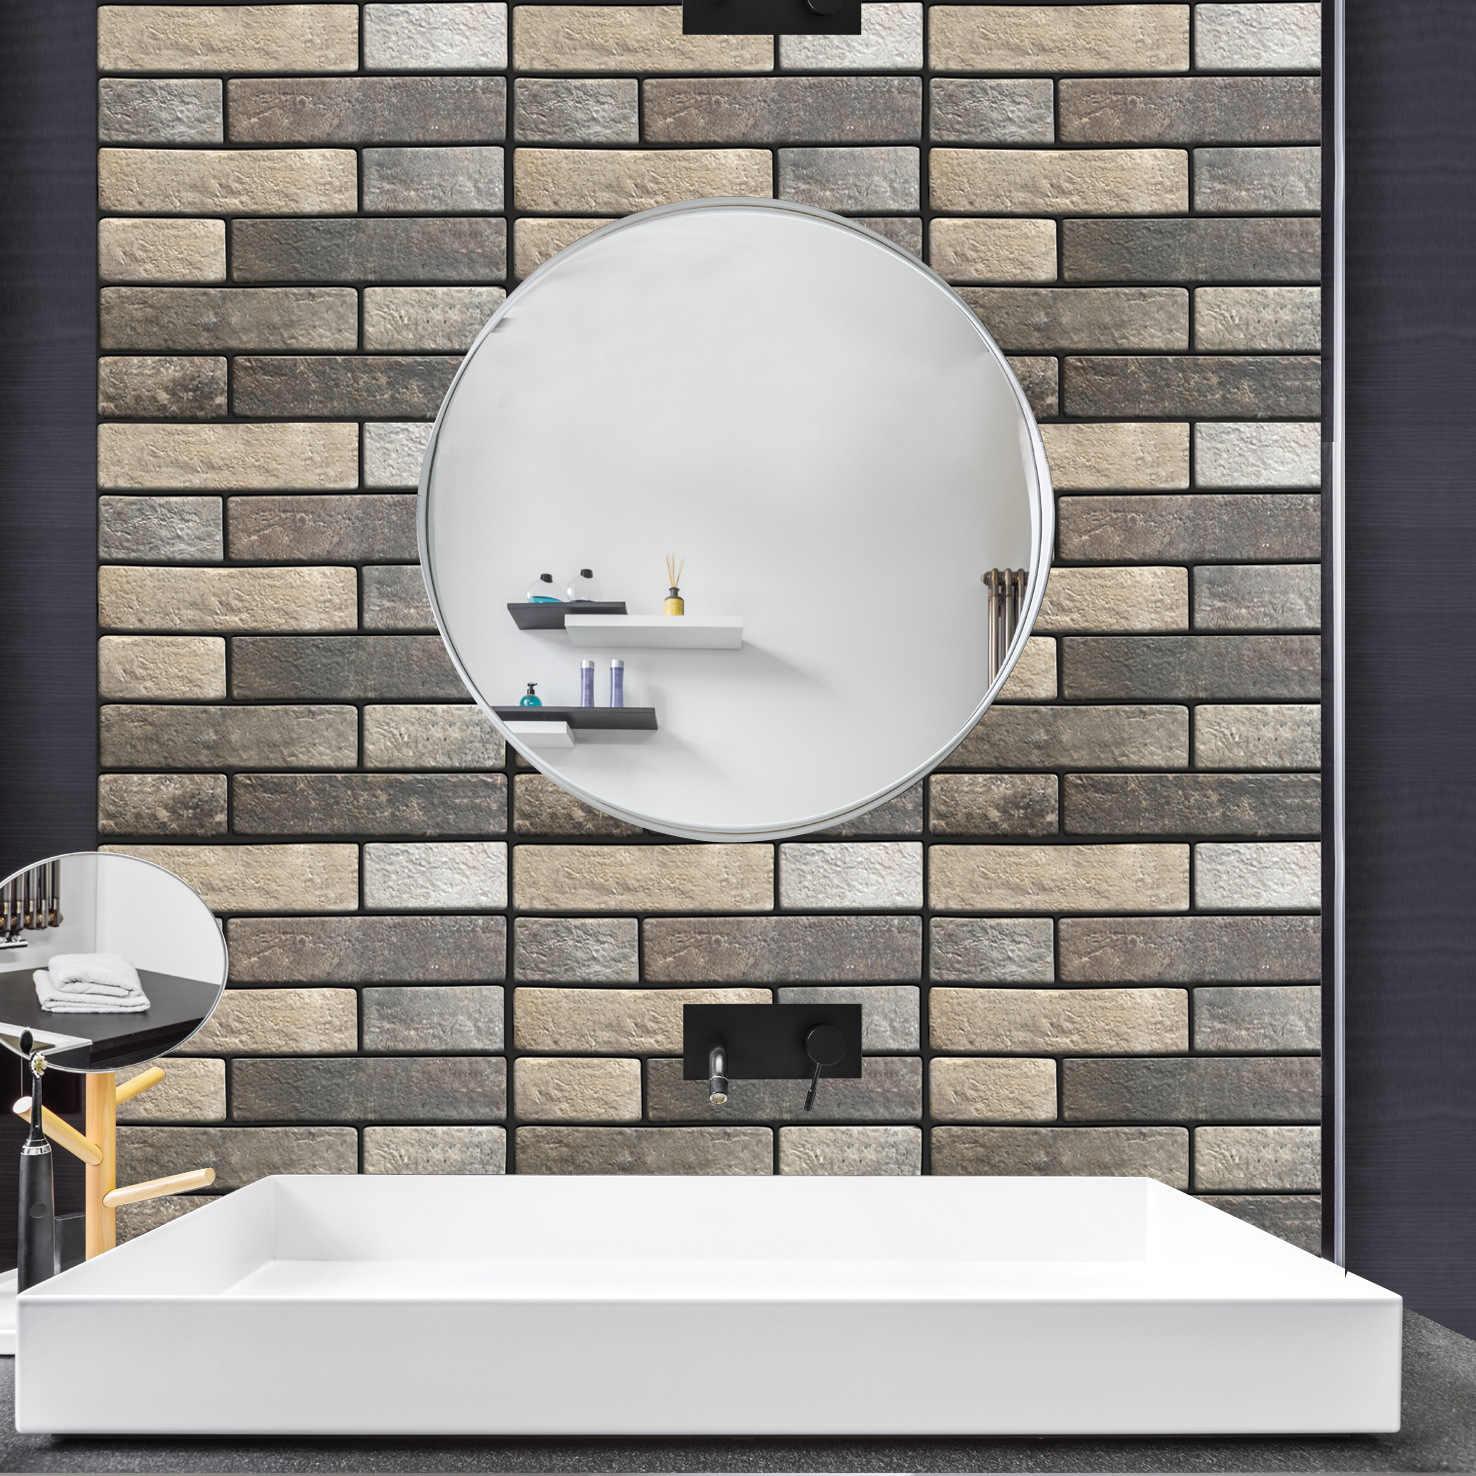 Piastrelle Pvc Adesive Cucina retro brick 3d adesivi per piastrelle pvc adesivo da parete